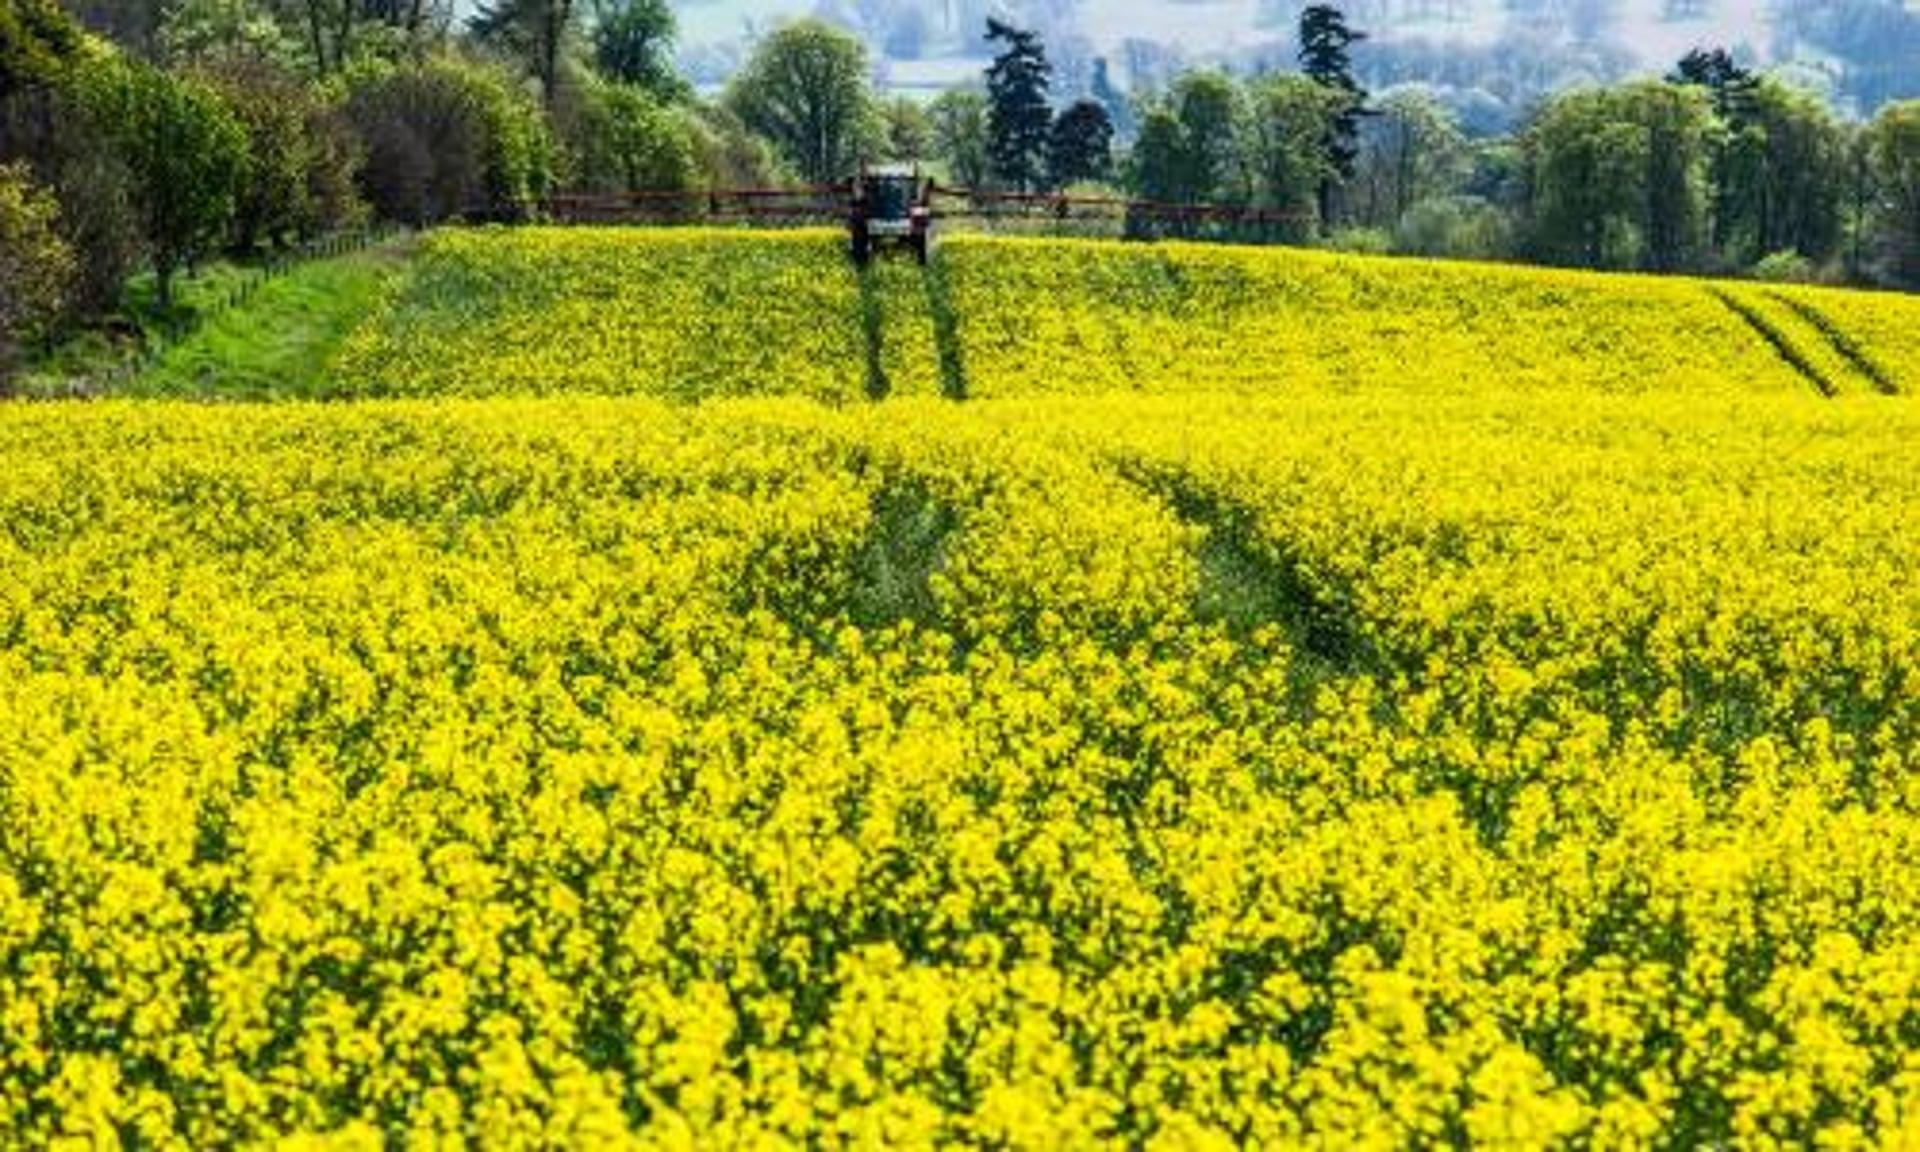 High pesticide levels on oilseed rape crops harm wild bees high pesticide levels on oilseed rape crops harm wild bees scientists prove environment the guardian mightylinksfo